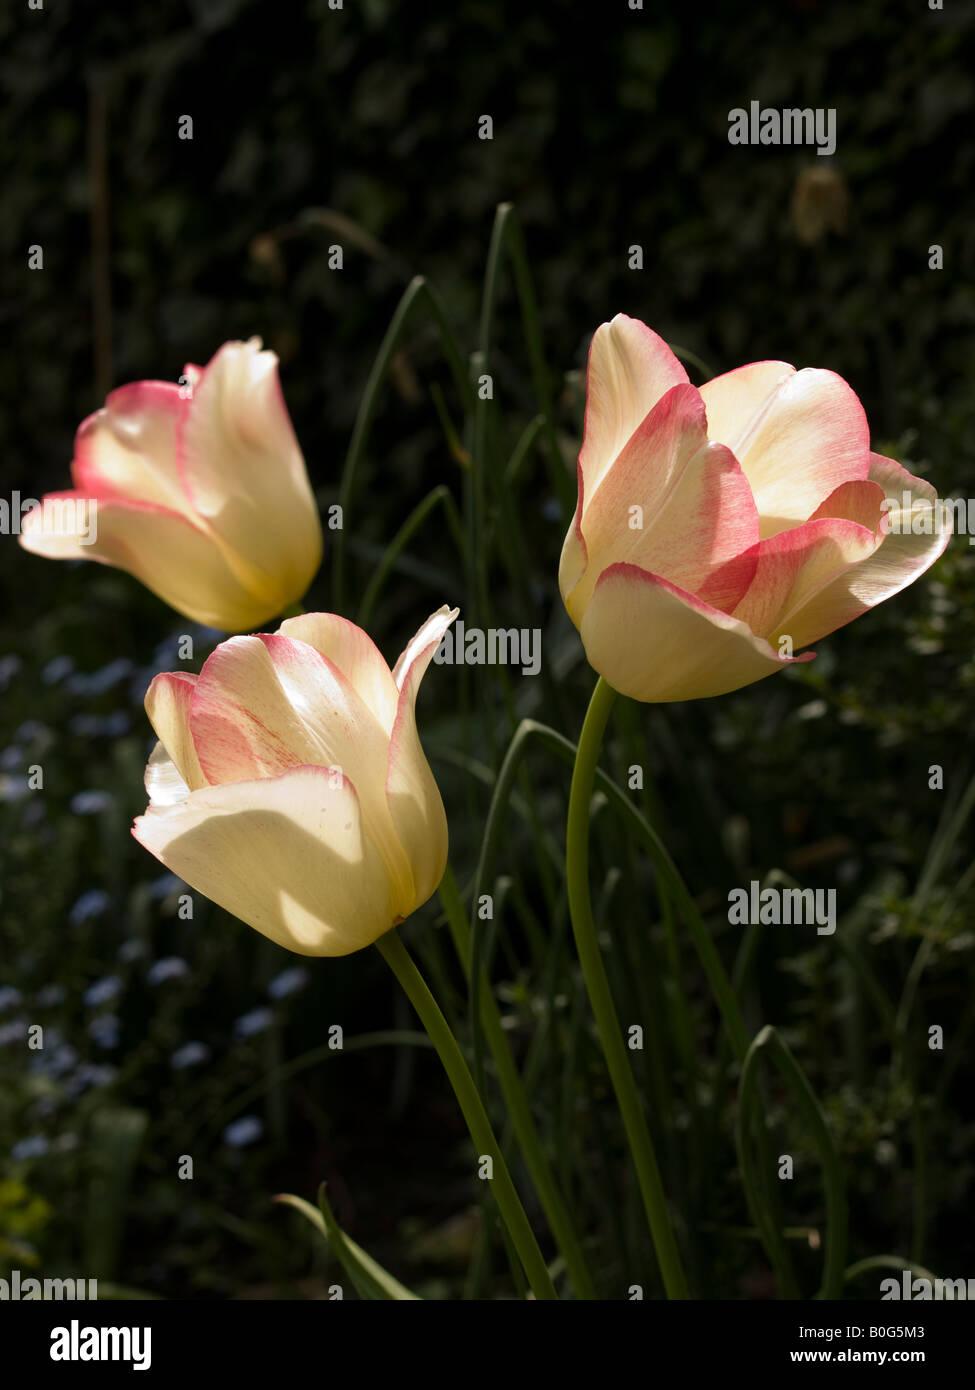 Three single tulips - Stock Image